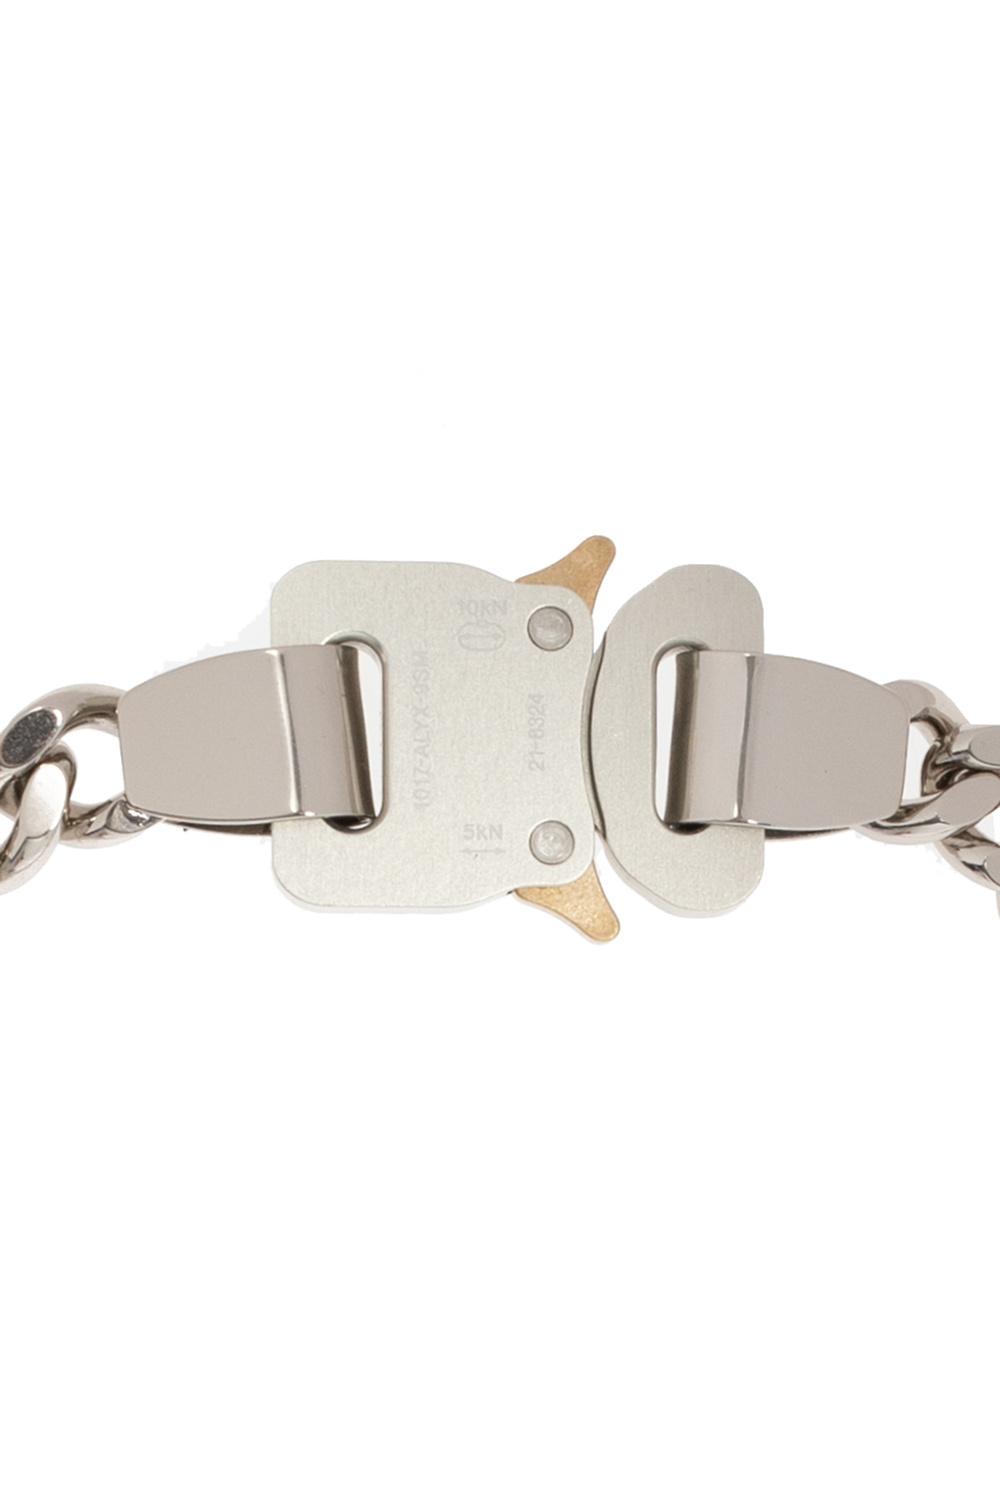 1017 ALYX 9SM Chain choker